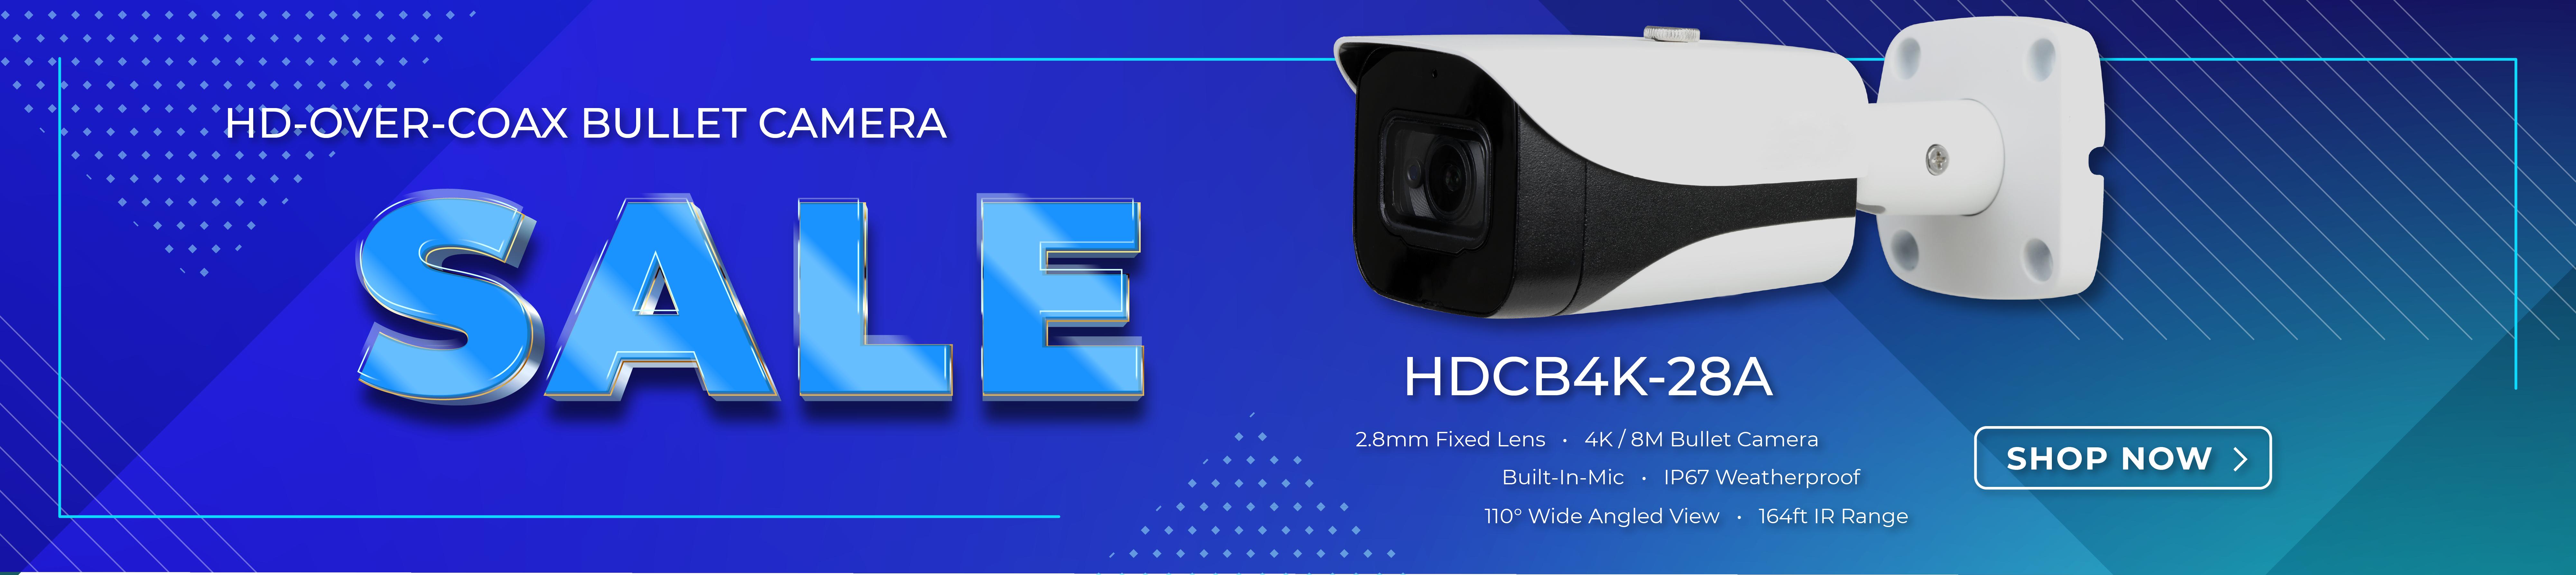 SALE – HDCB4K-28A – Website Banner-03